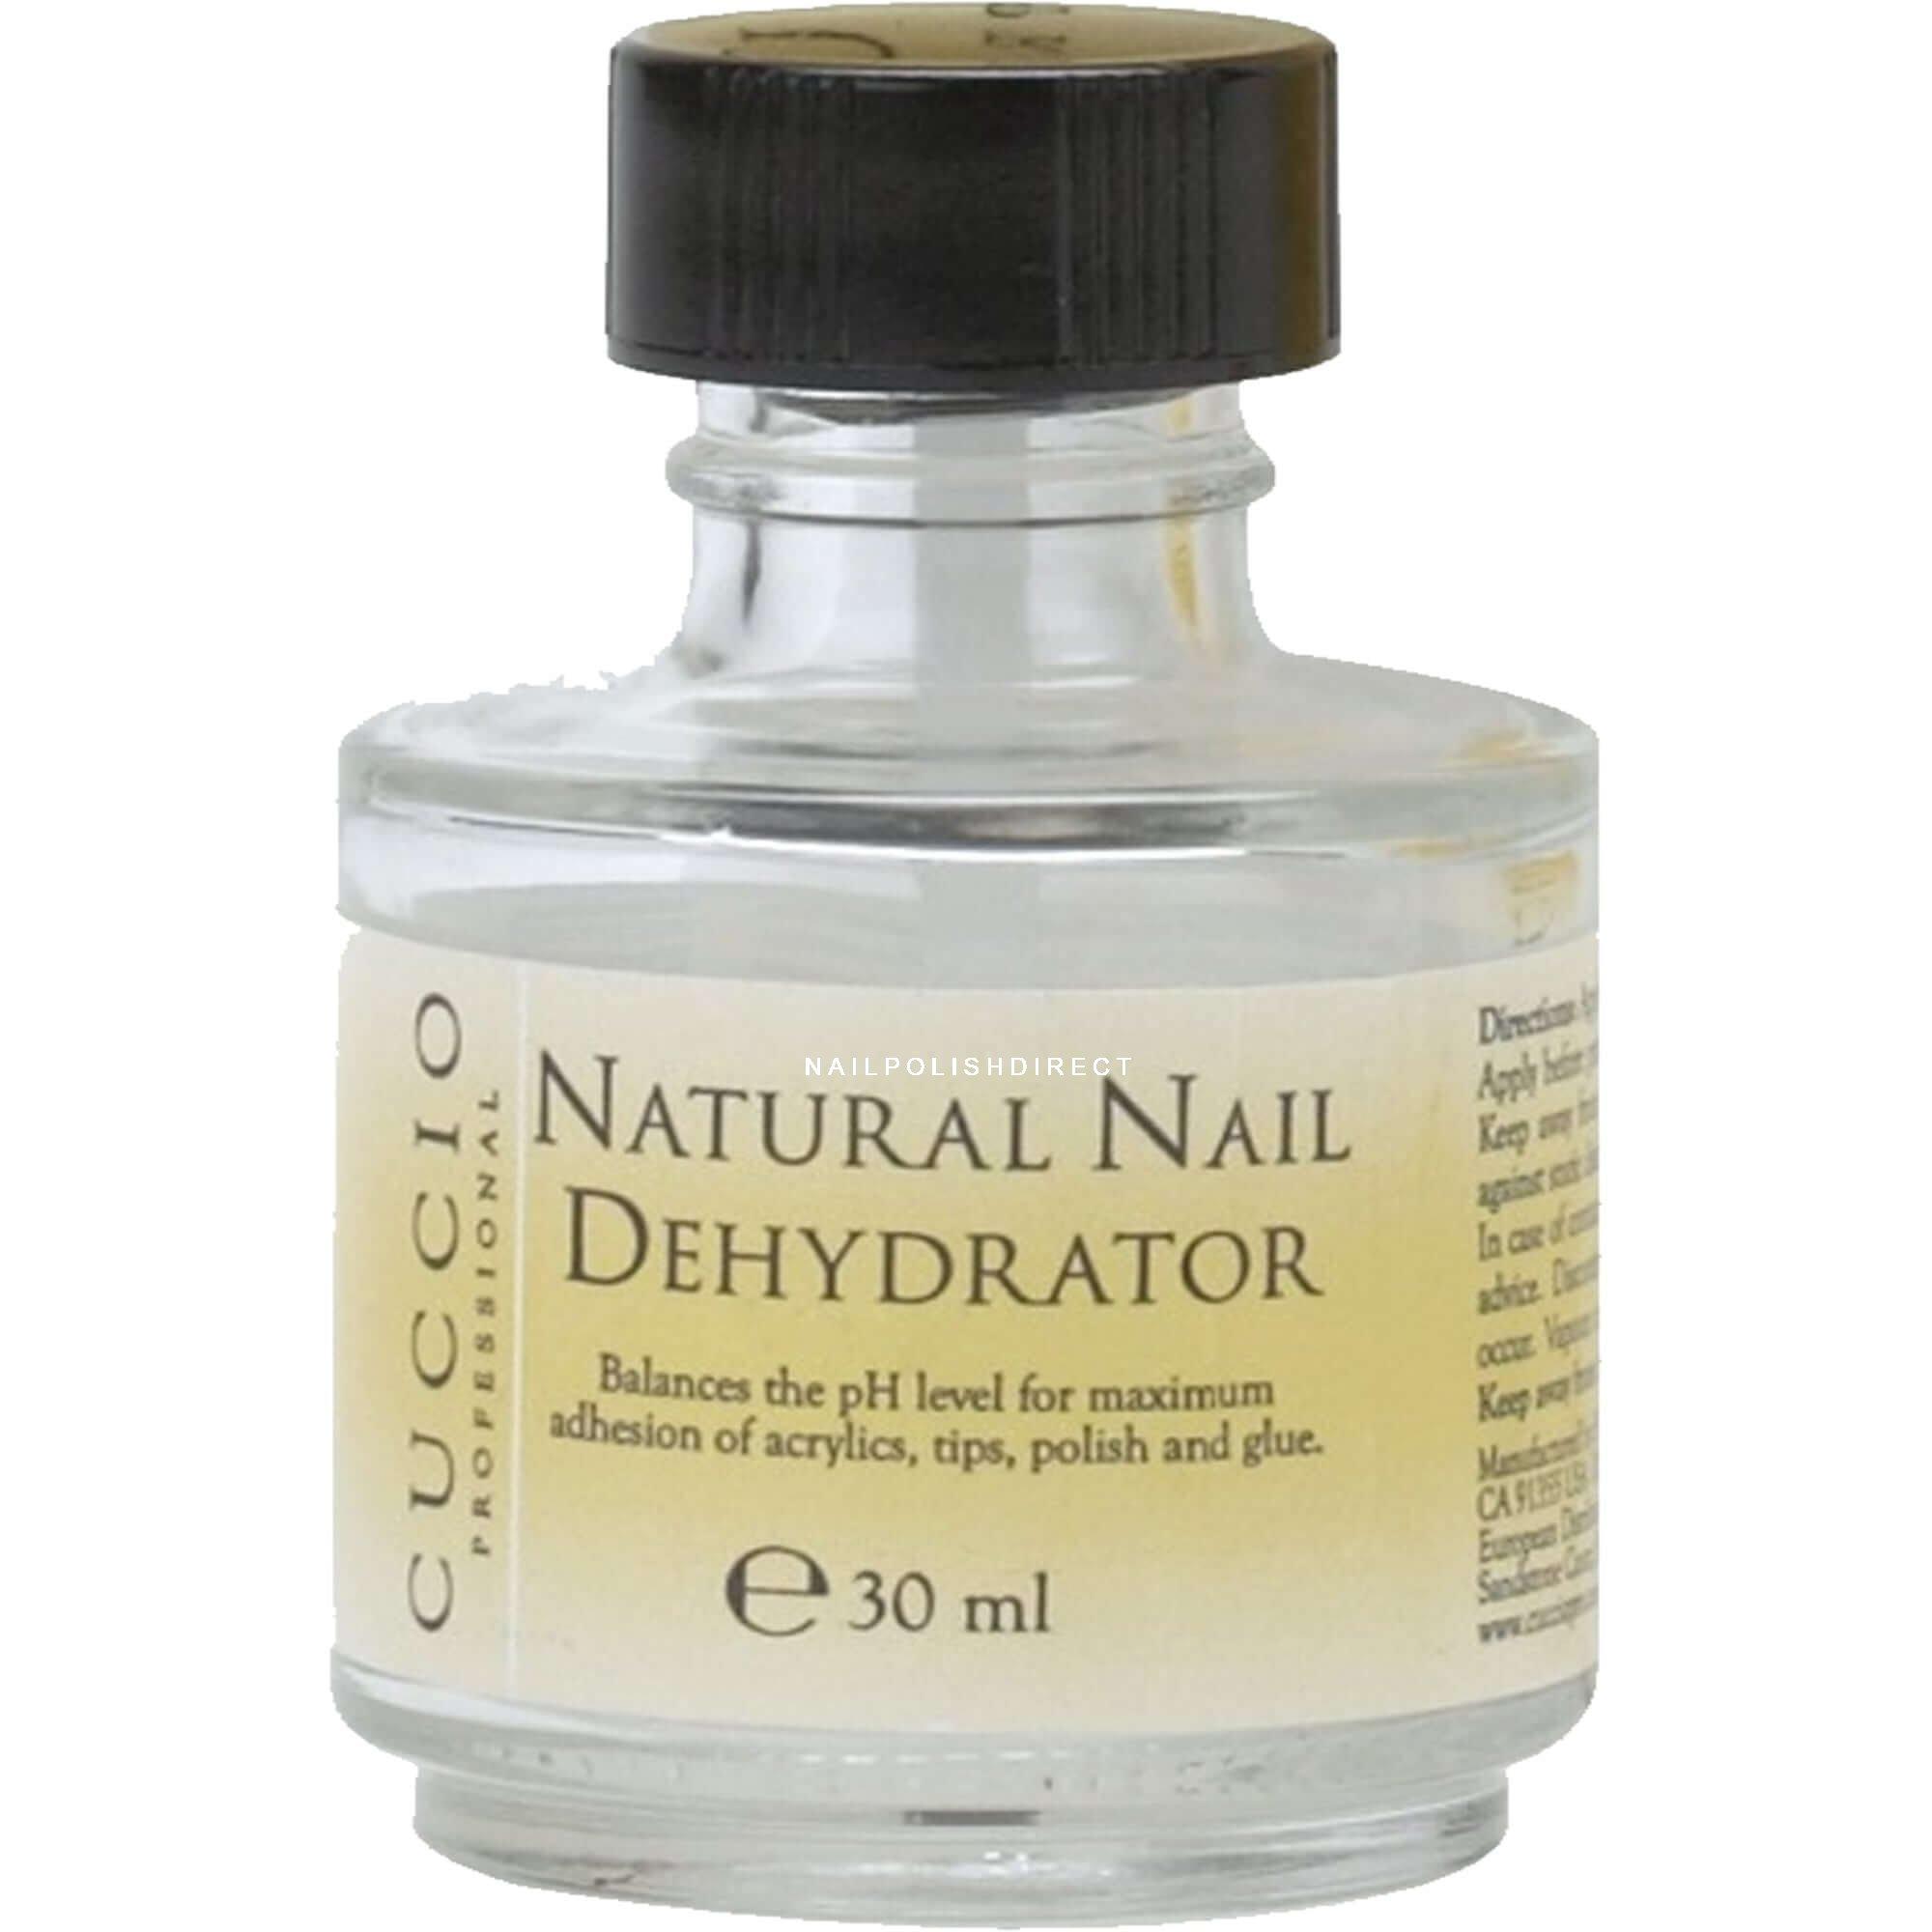 Cuccio Professional Natural Nail - Dehydrator 30ml